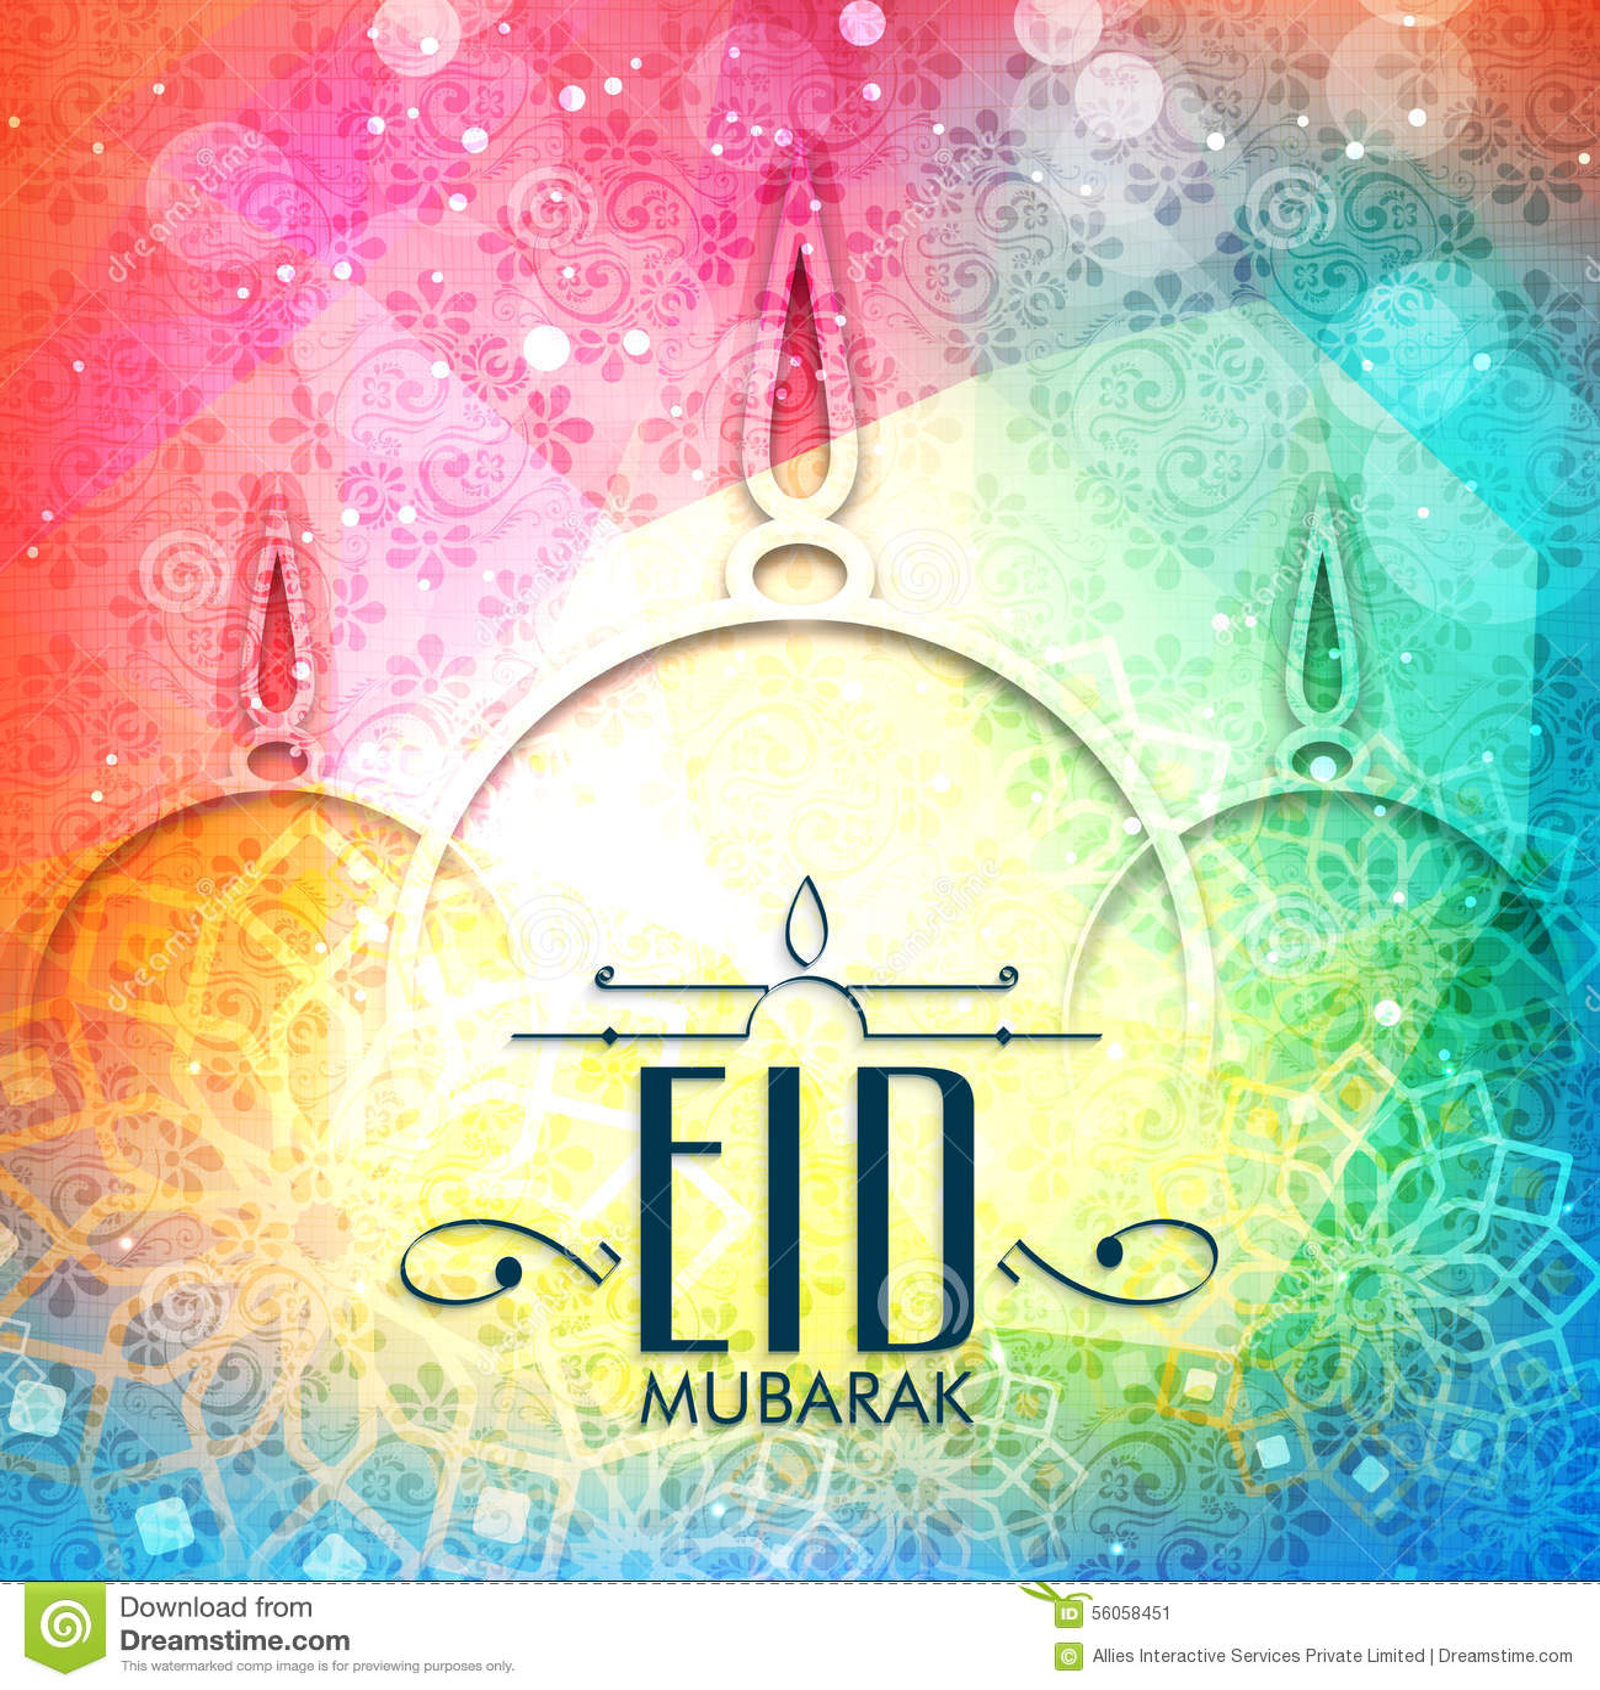 Eid Mubarak Greeting Social Banner Royalty Free Stock Photography